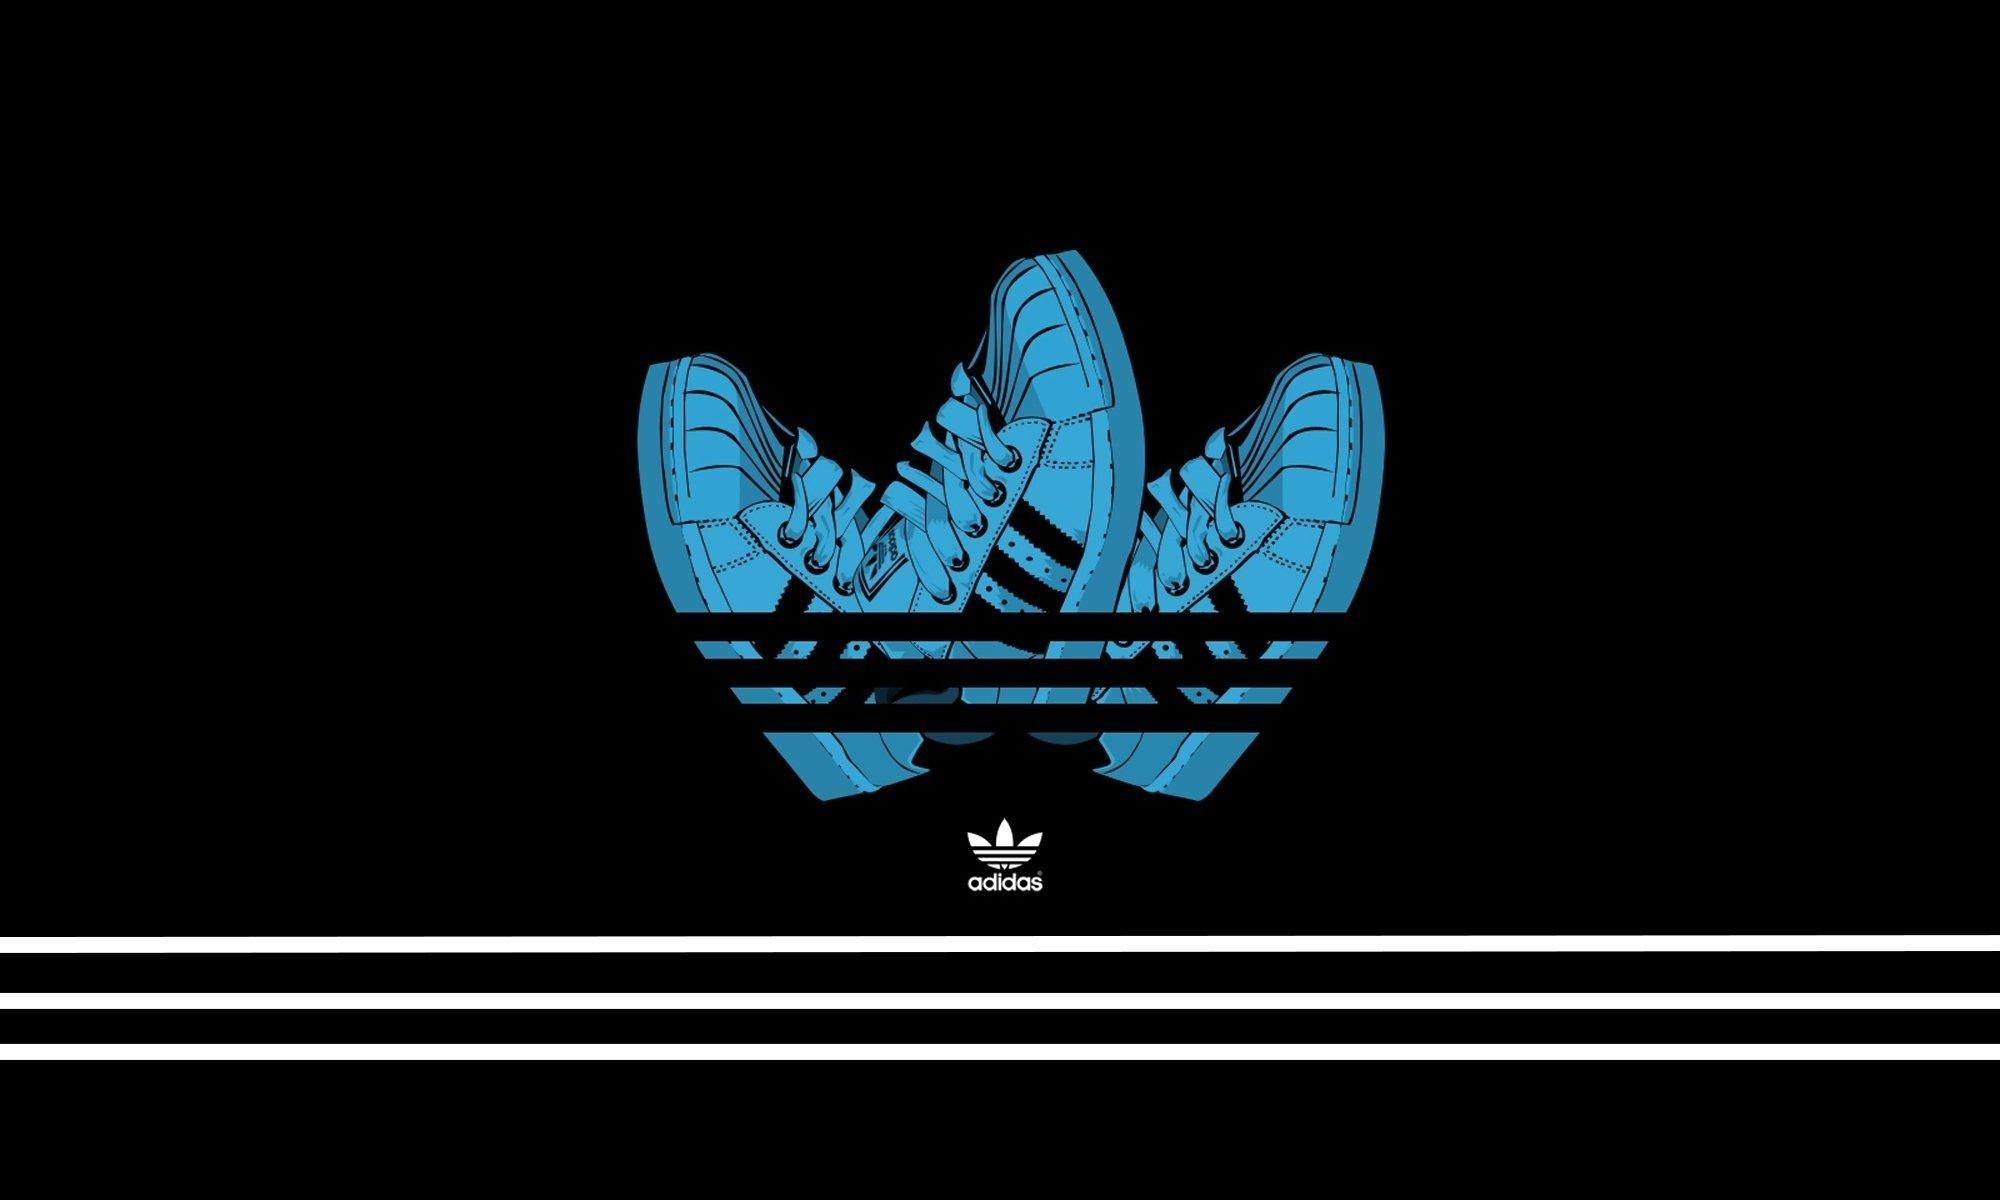 adidas adidas minimalism background black shoes HD wallpaper 2000x1200